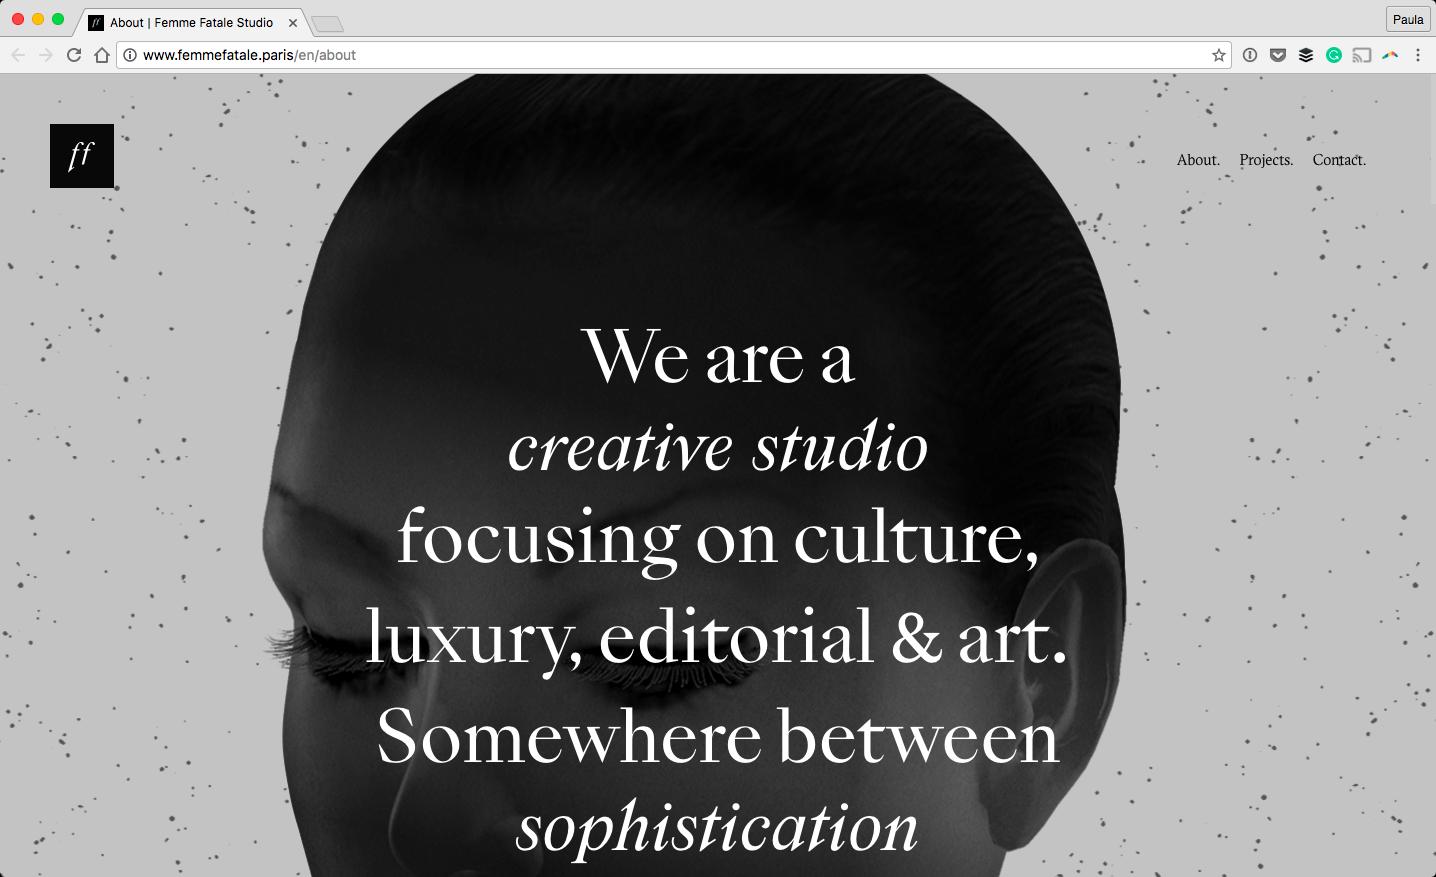 about-femme-fatale-studio-2016-09-30-21-37-16